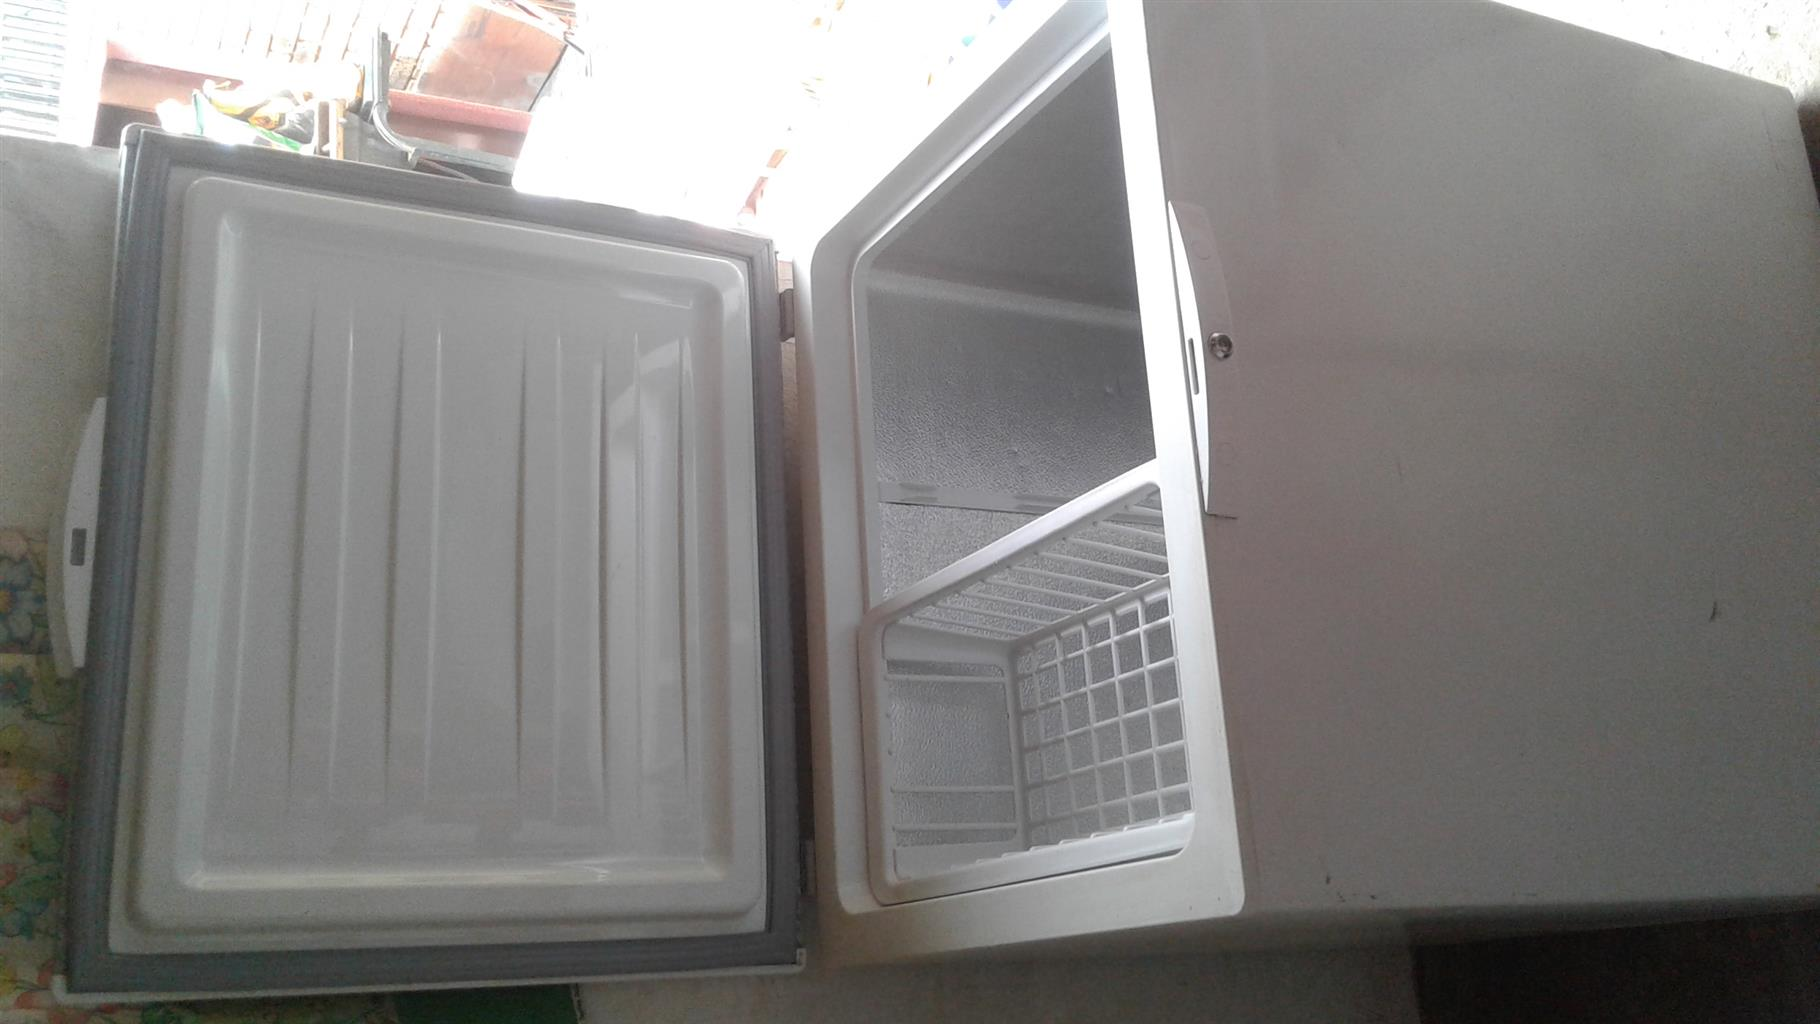 210L Freezer for sale